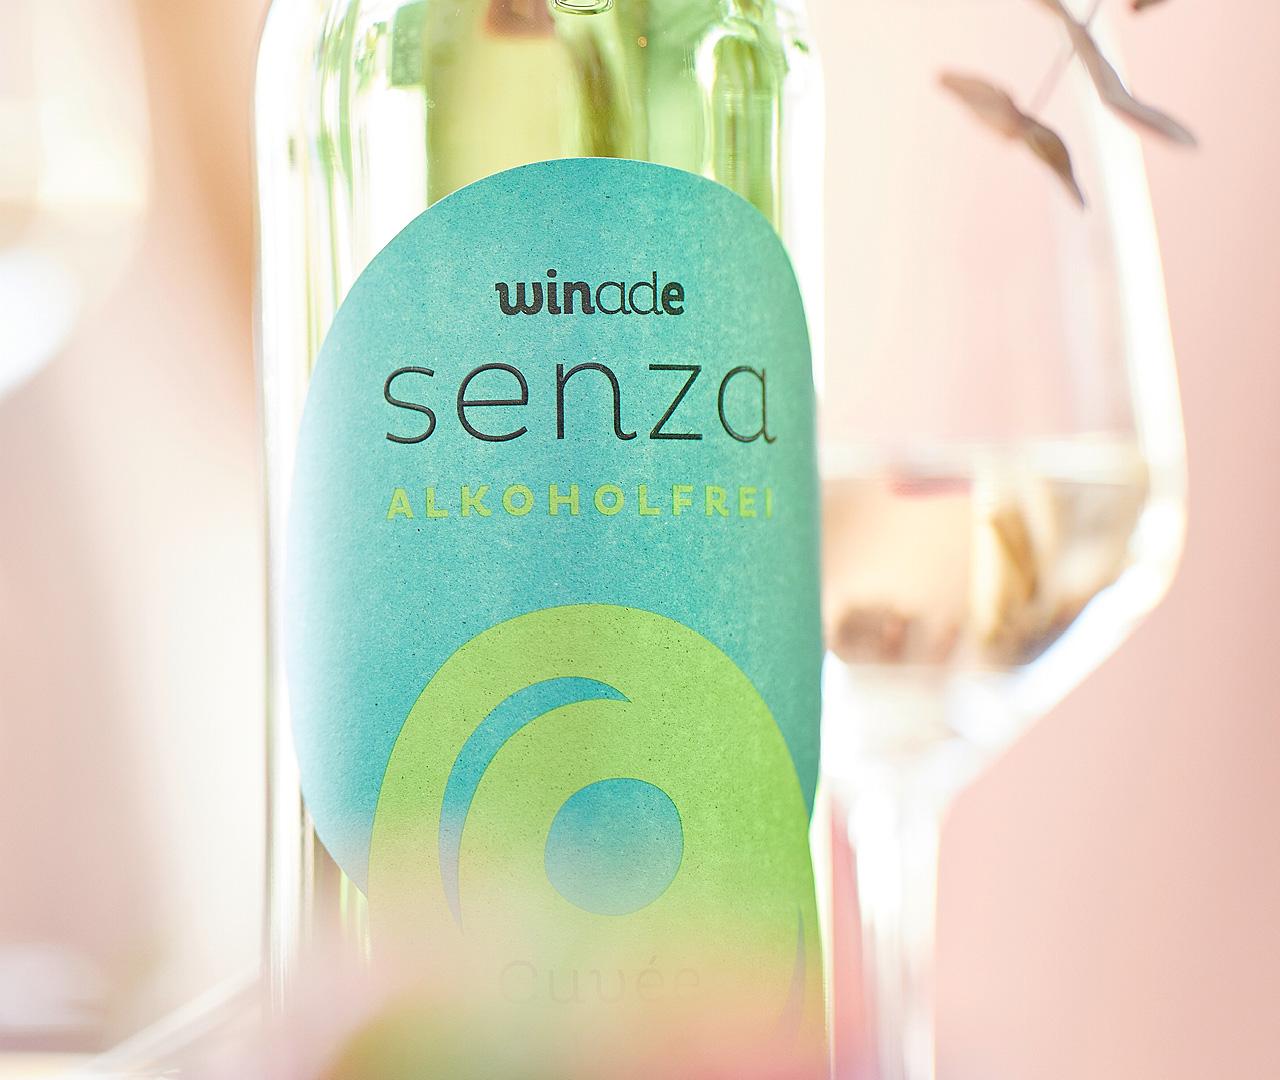 Detail Verpackungsdesign Senza